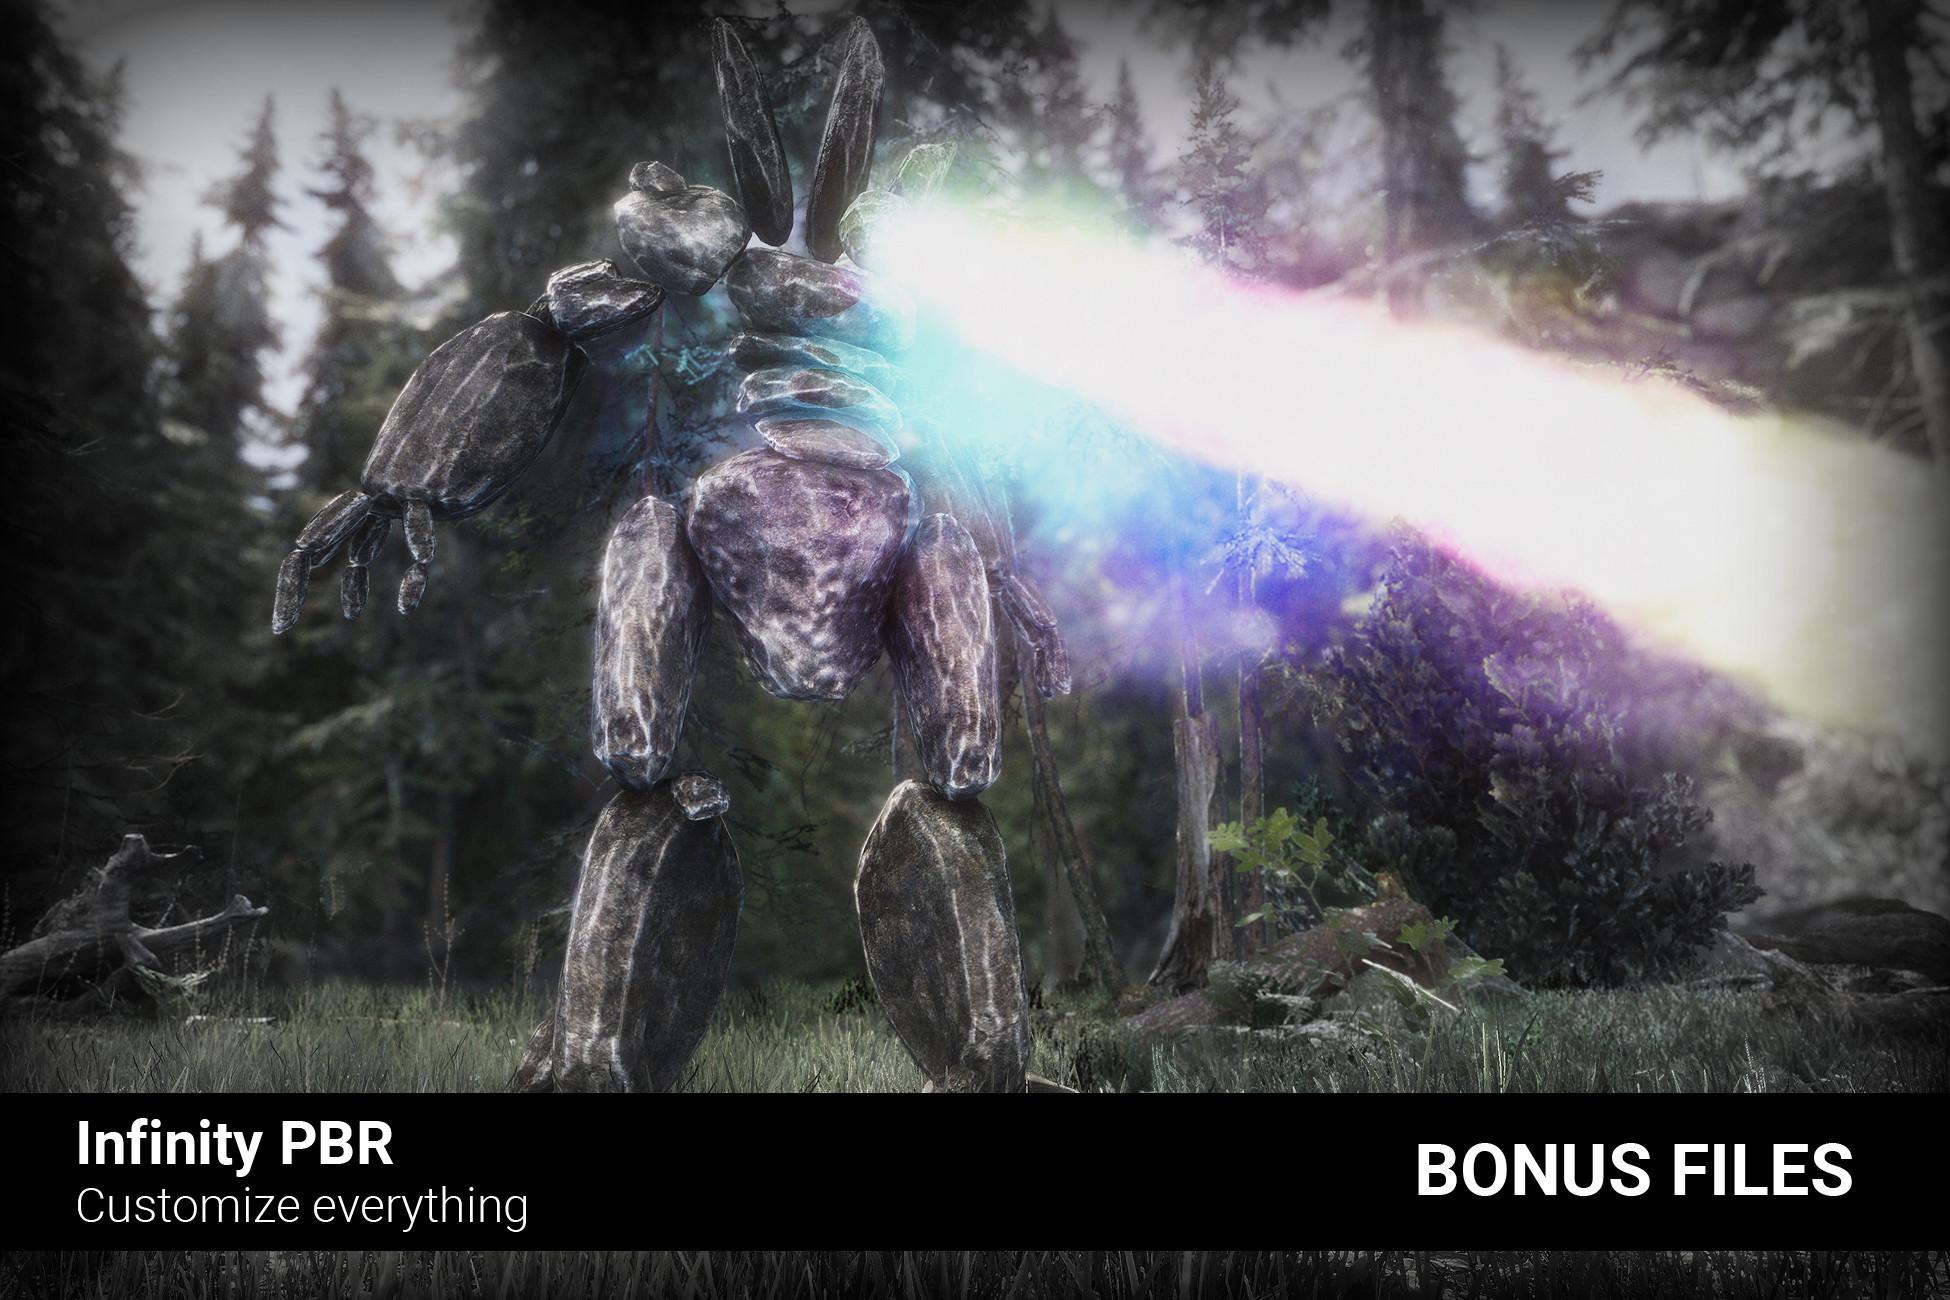 Rock Monster - Bonus Files 3 - Unreal Project